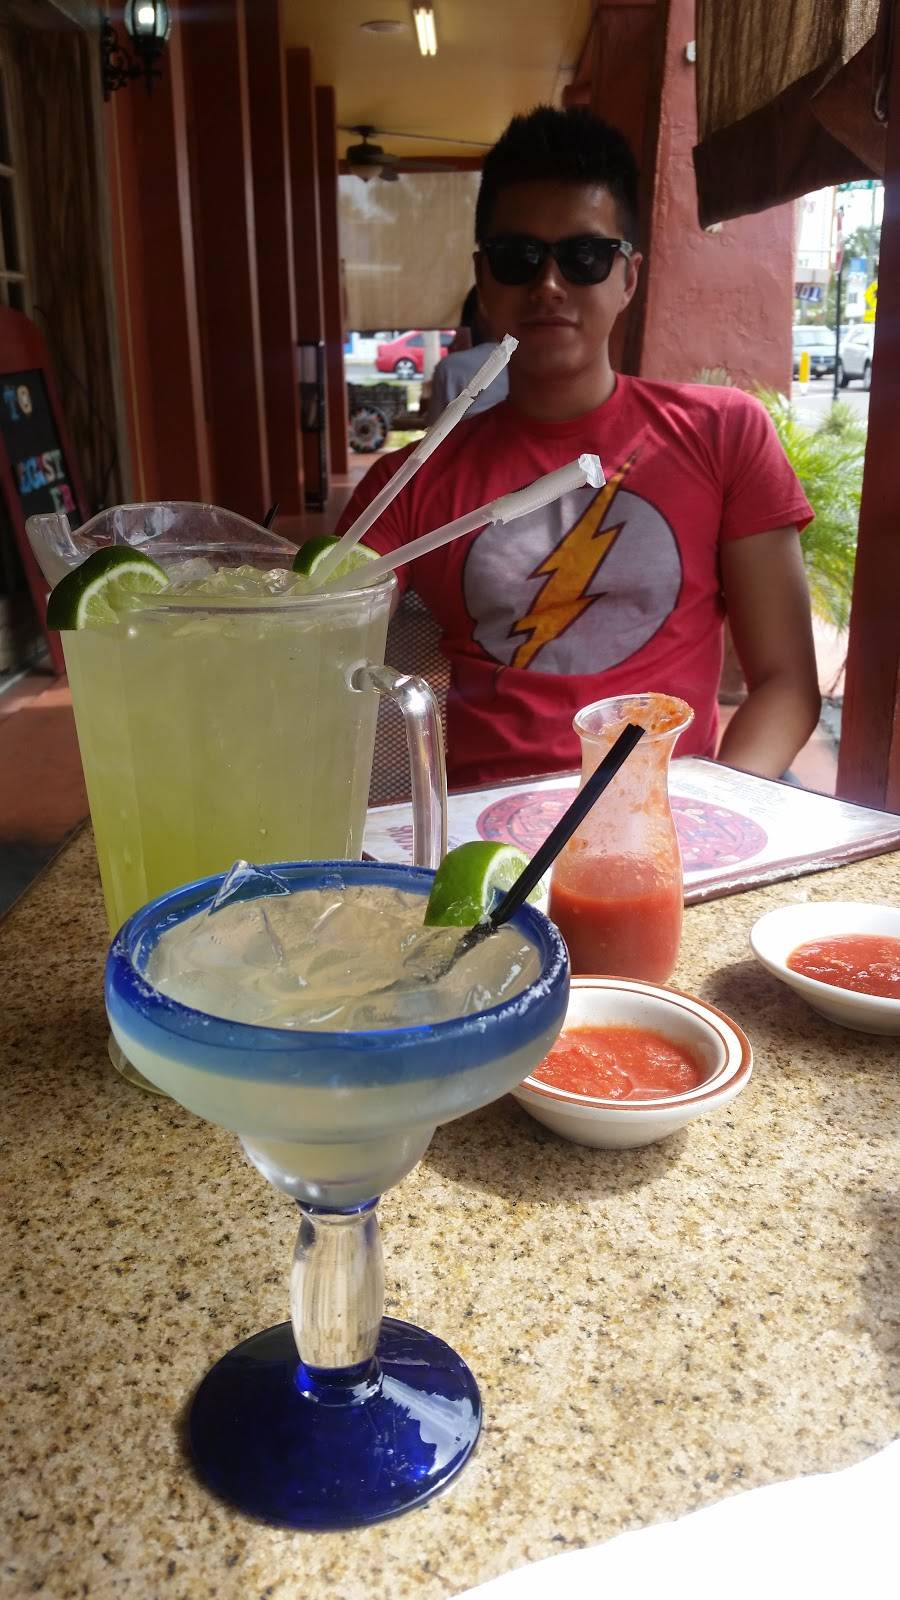 Los Mexicanos | restaurant | 38954 US-19, Tarpon Springs, FL 34689, USA | 7279450777 OR +1 727-945-0777